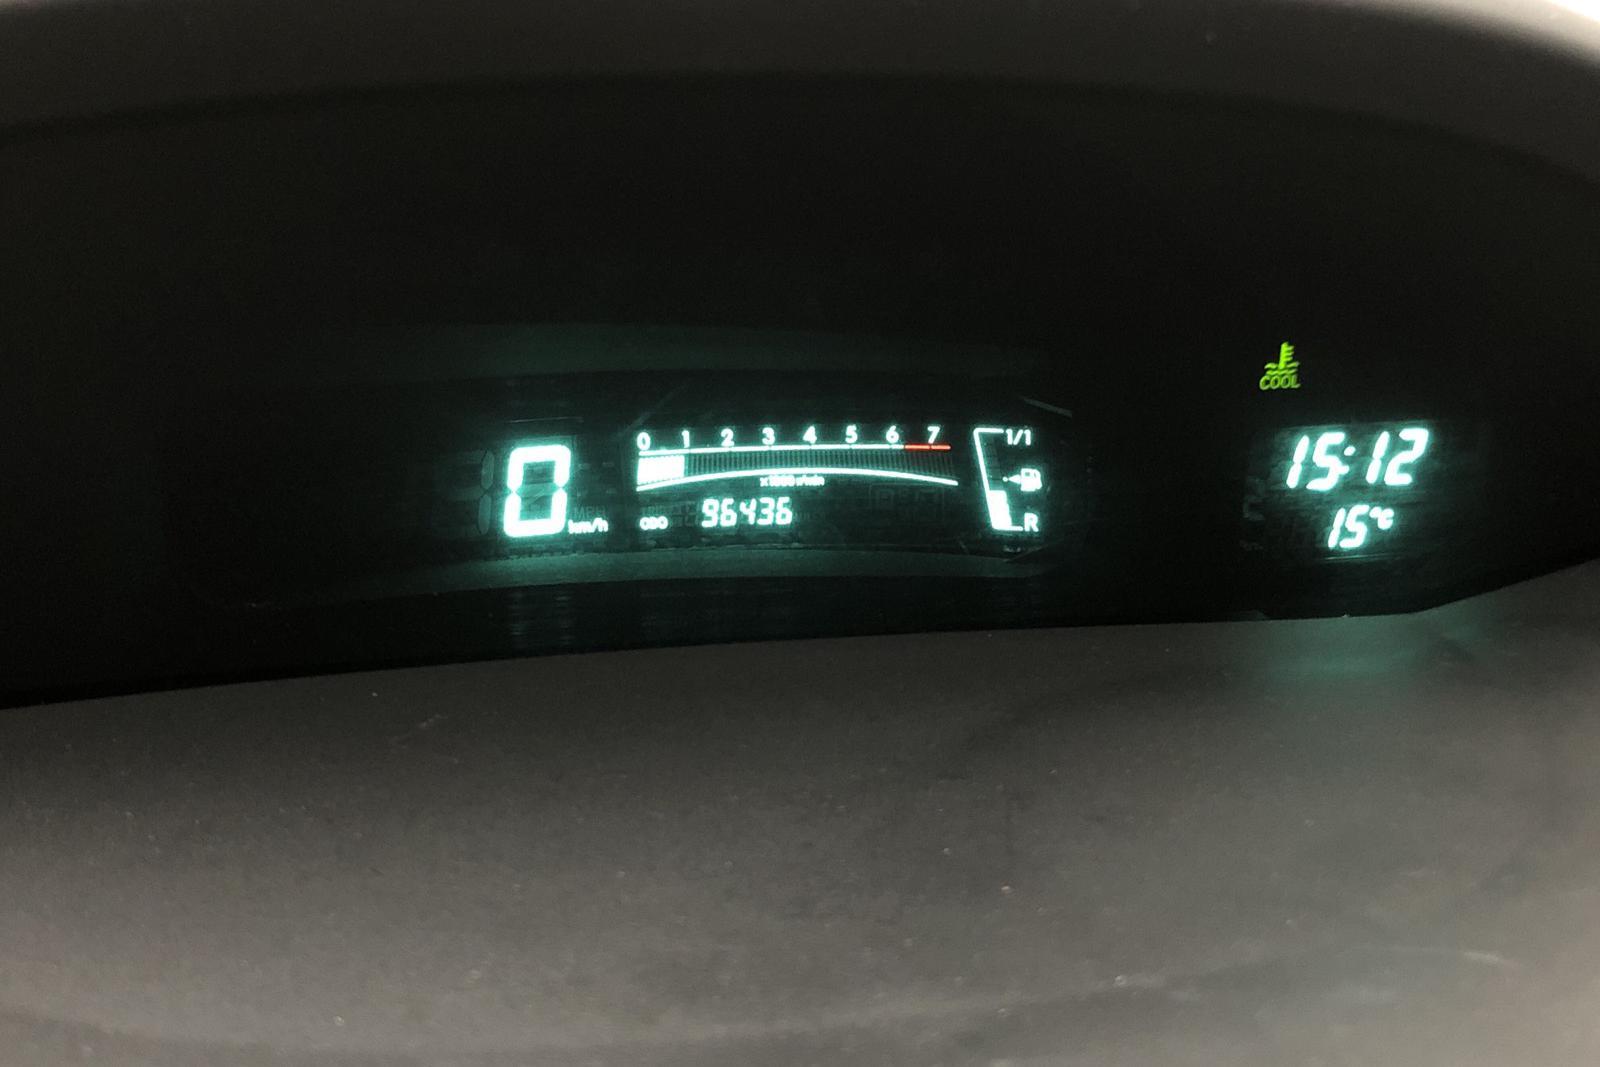 Toyota Yaris 1.0 5dr (69hk) - 93 000 km - Manual - silver - 2008